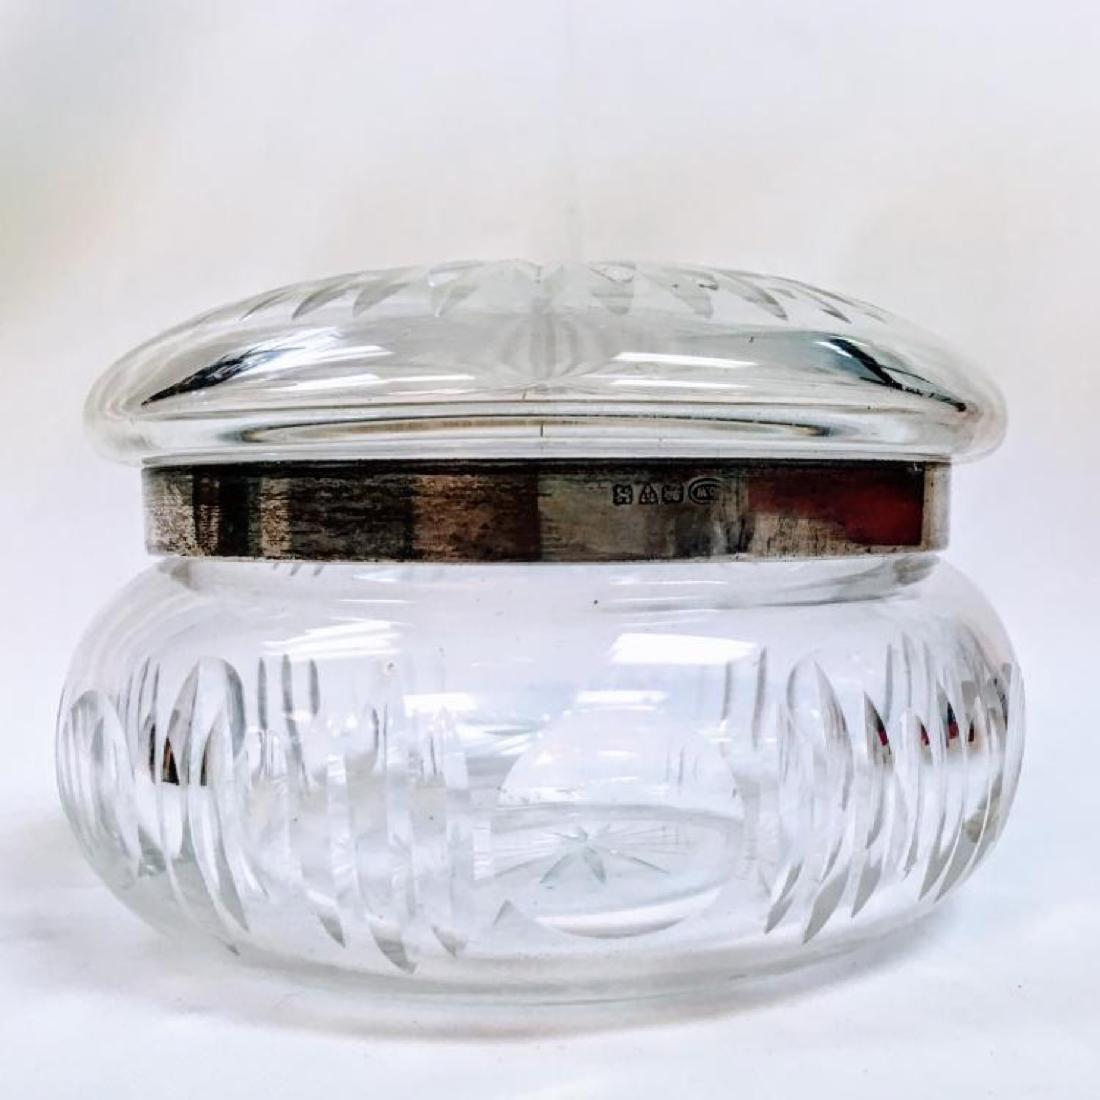 ANTIQUE STERLING SILVER LIDDED CUT GLASS POWDER JAR